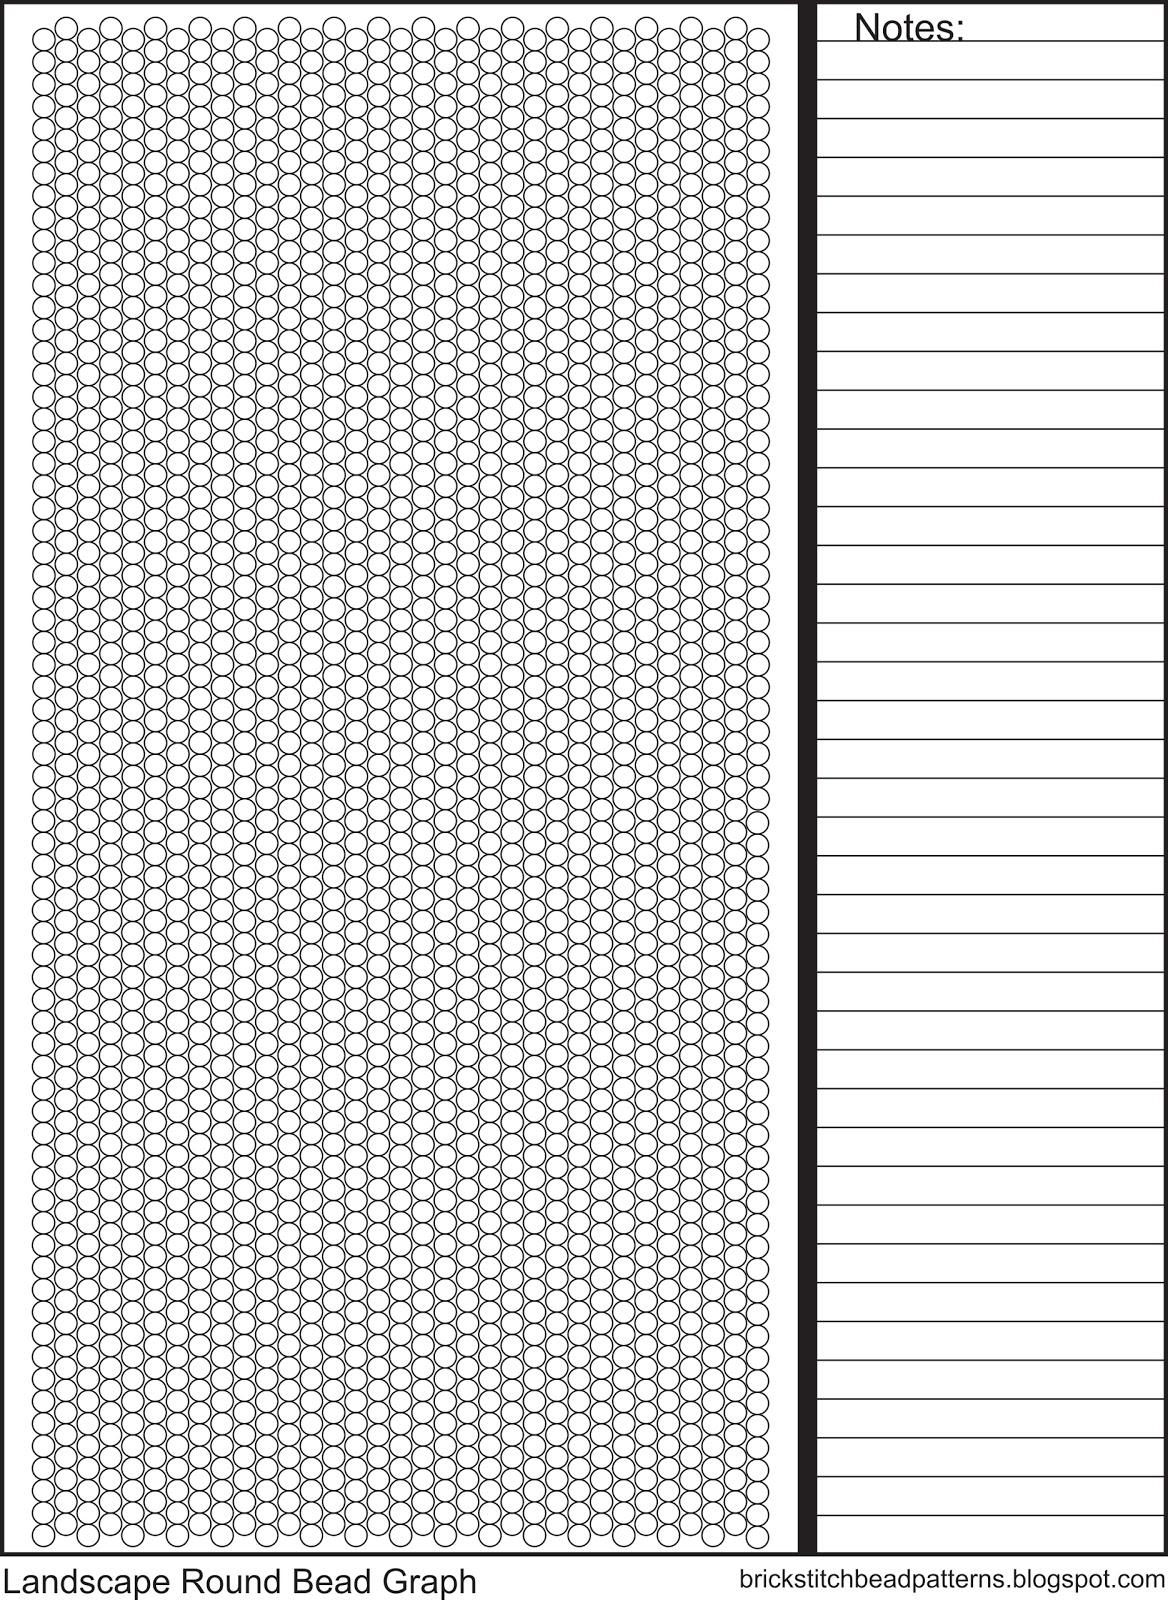 brick stitch bead patterns journal  universal landscape round seed bead brick stitch graph paper